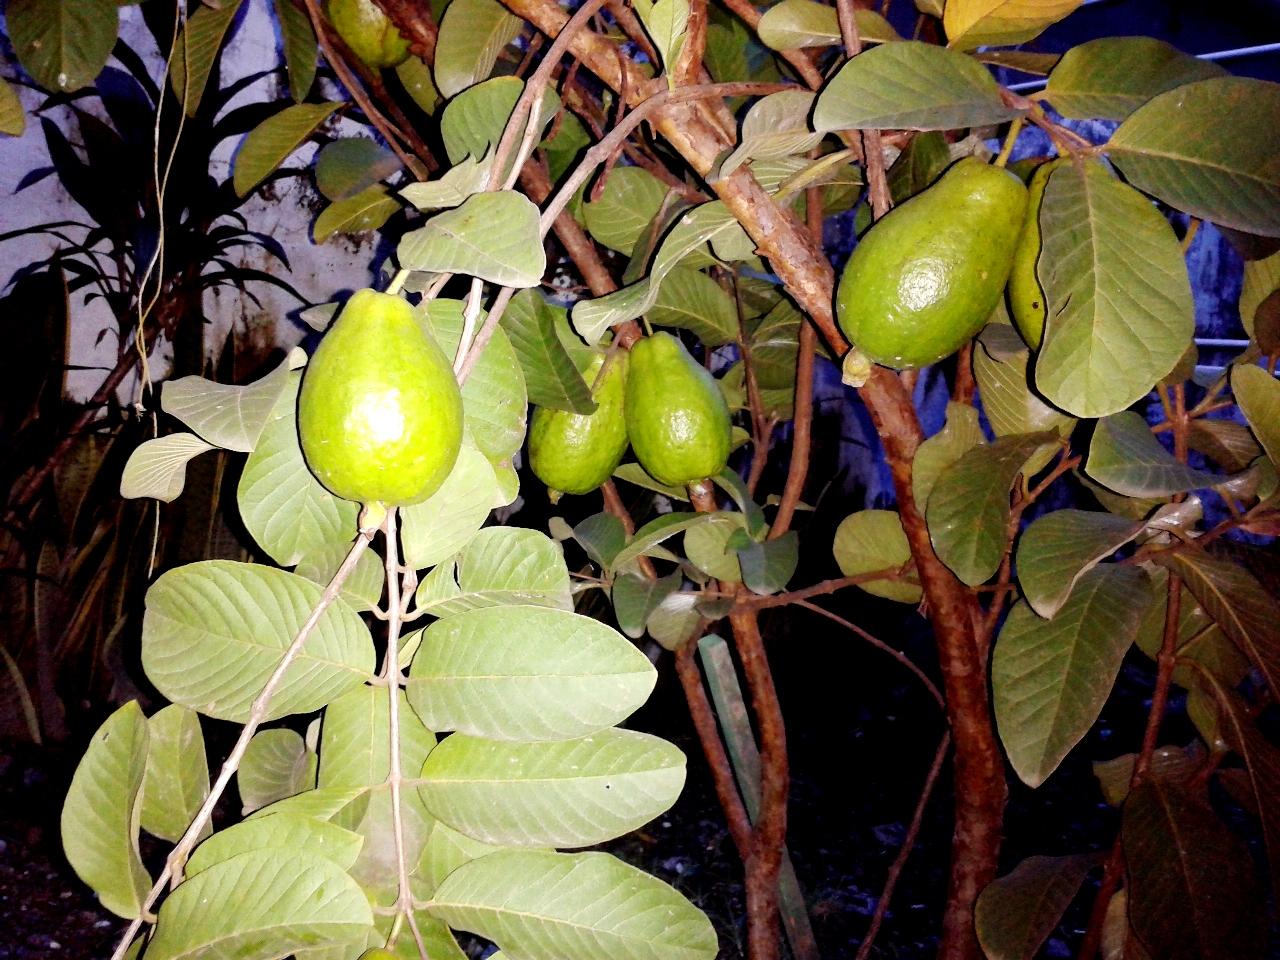 tebak pohon jambu biji